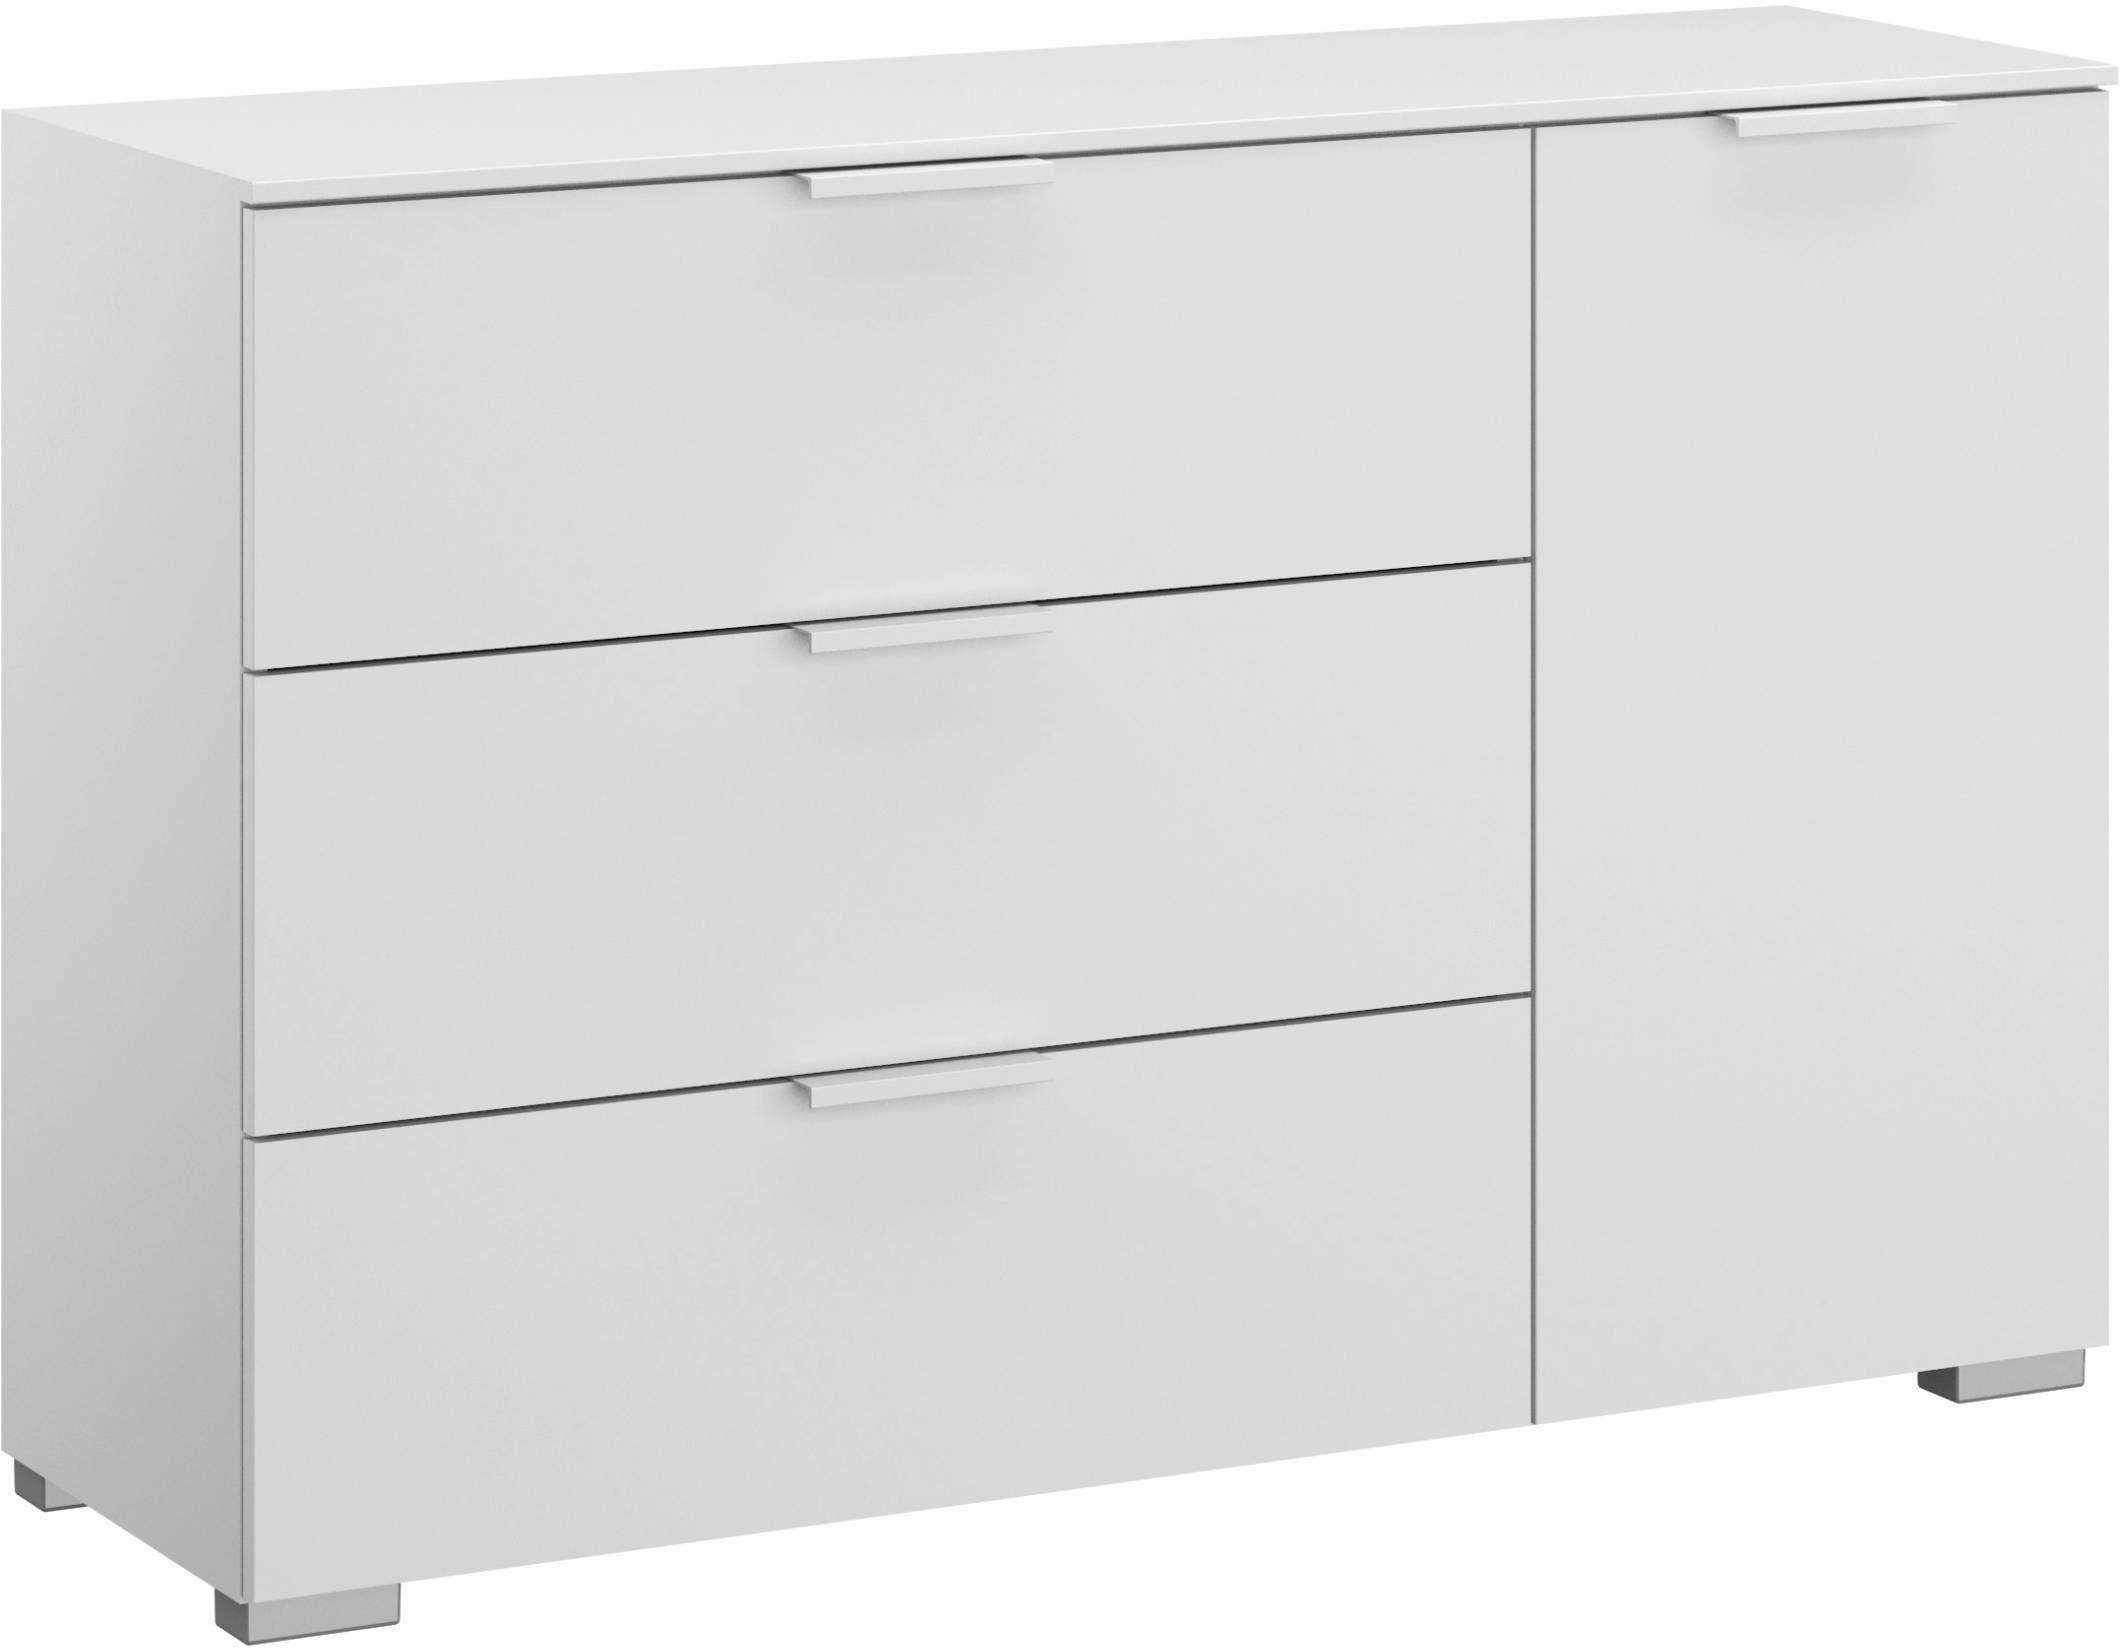 rauch SELECT Kommode »Dressbox«, Breite 120 cm